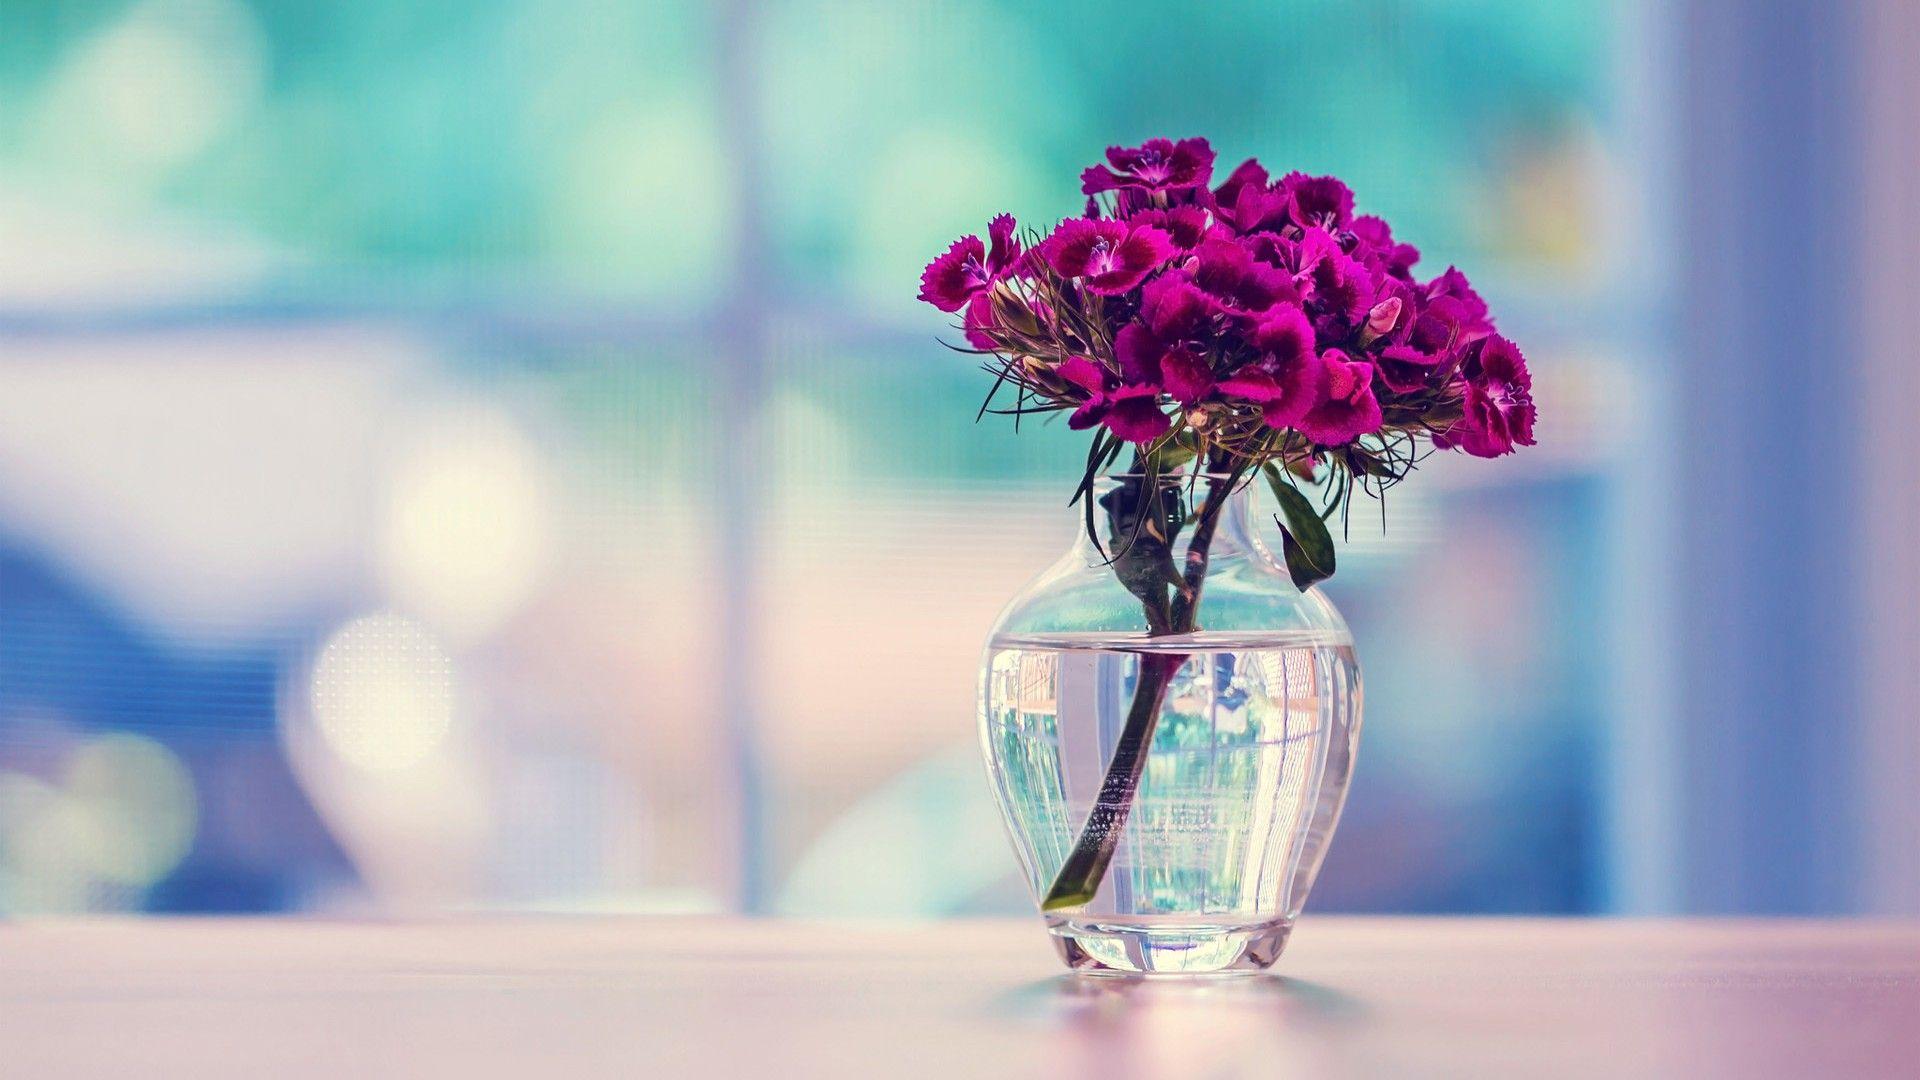 Beautiful flowers hd wallpaper 19201080 beautiful wallpaper beautiful flowers hd wallpaper 19201080 izmirmasajfo